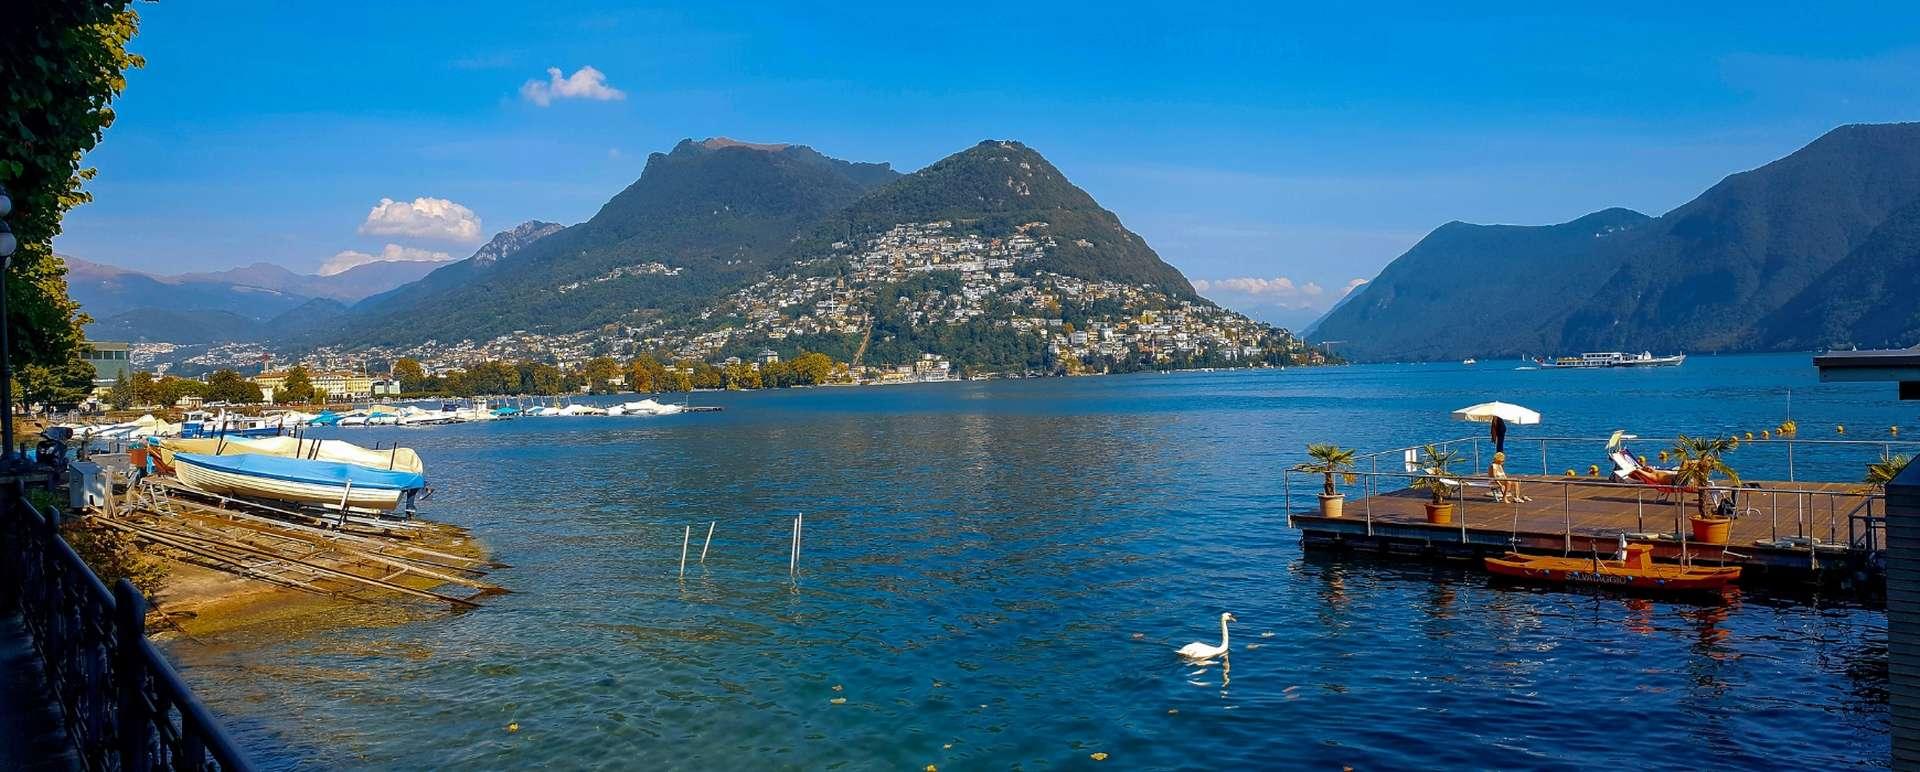 Lugano am Luganer See